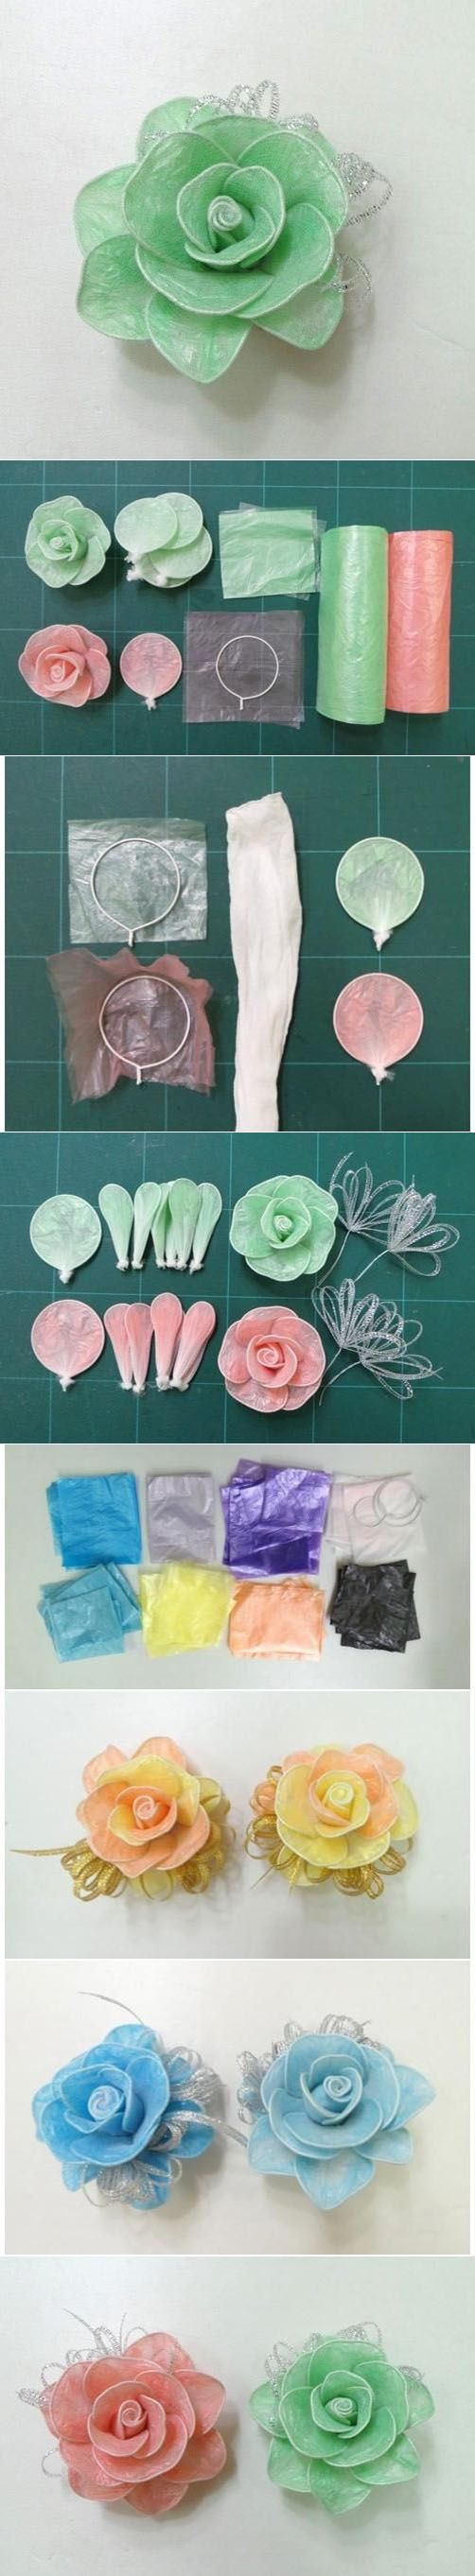 Diy Beautiful Flowers | DIY & Crafts Tutorials